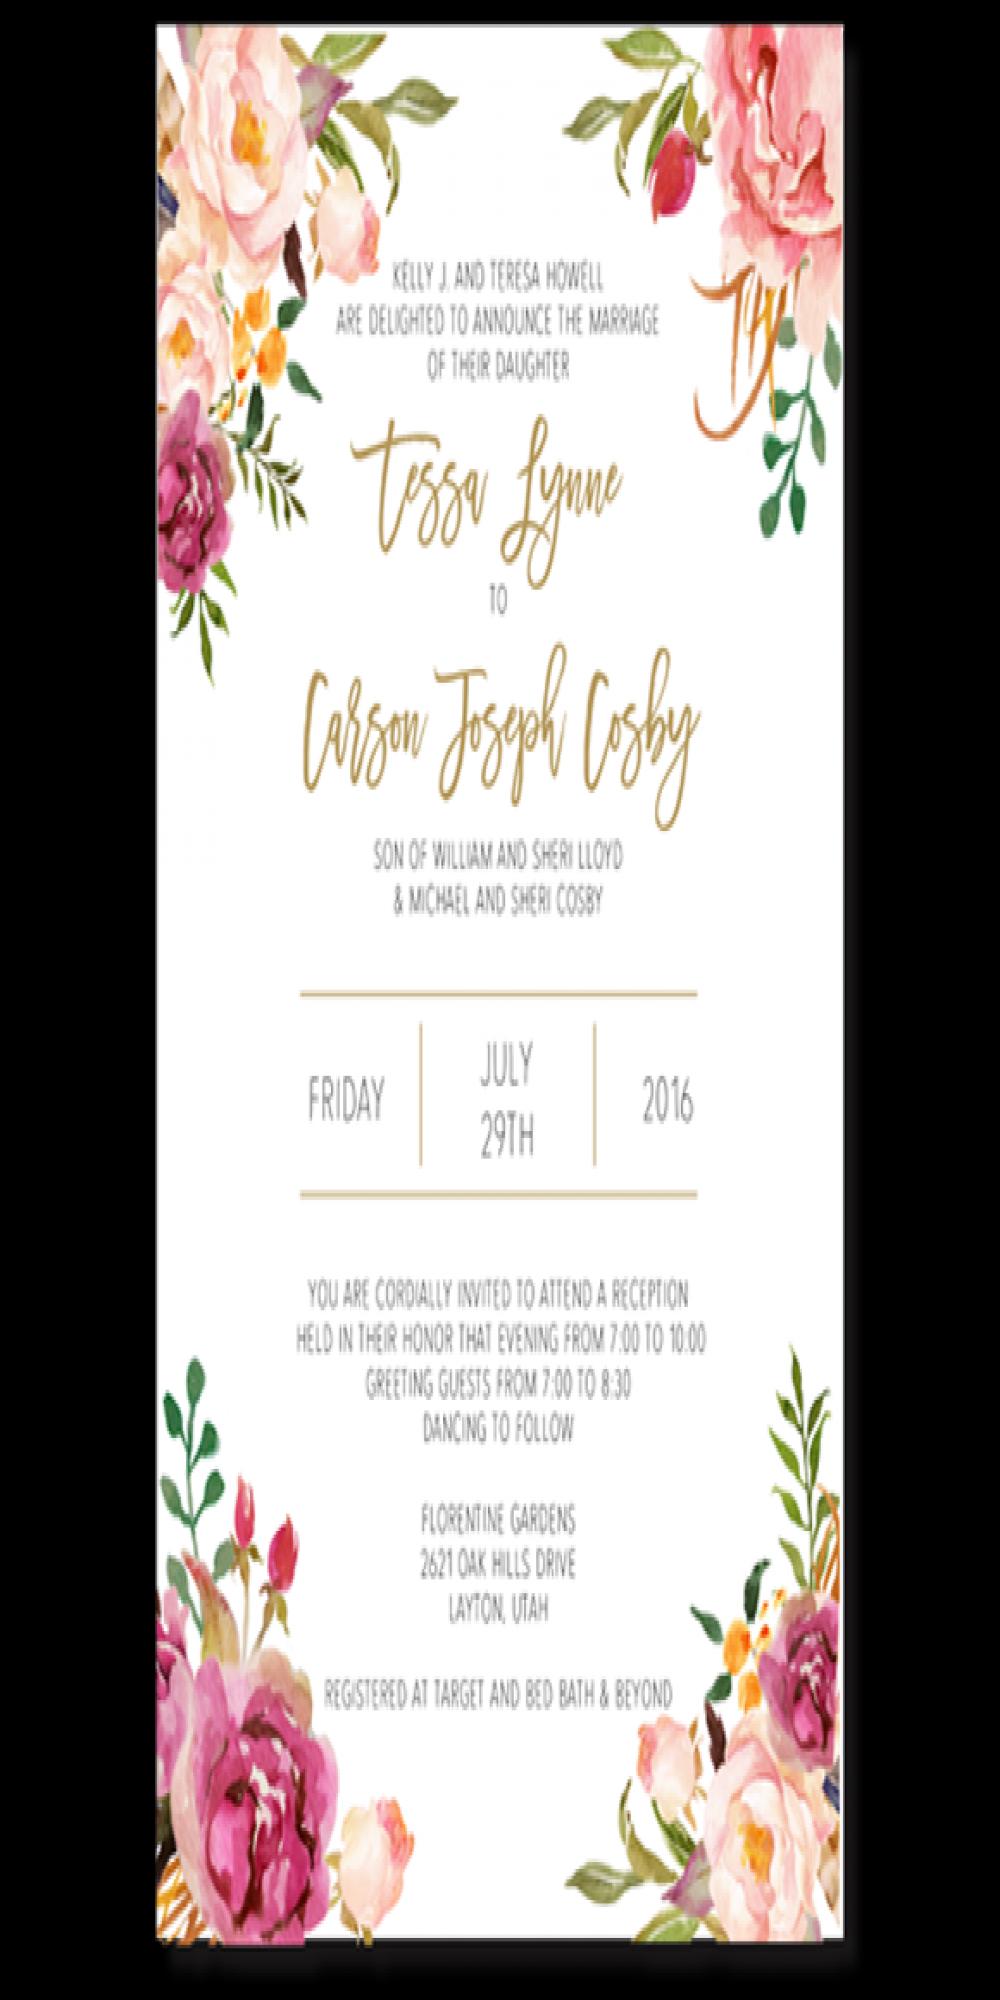 Cheap Wedding Invitations Cheap Wedding Invitations Beautiful Wedding An Wedding Invitations Online Utah Wedding Invitations Discount Wedding Invitations